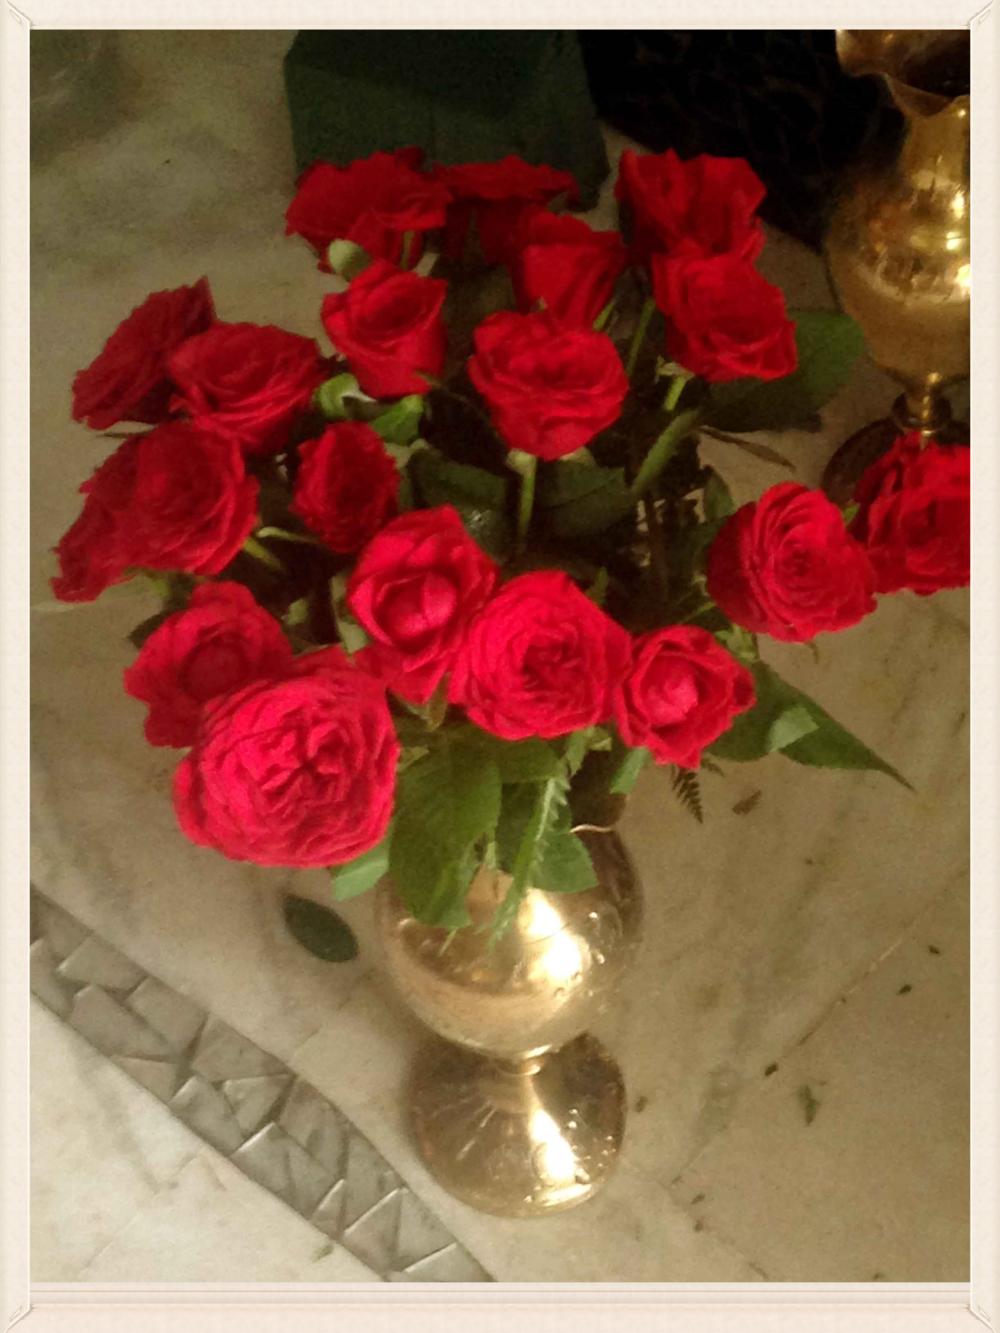 Roses in a vase, image©gunjanvirk